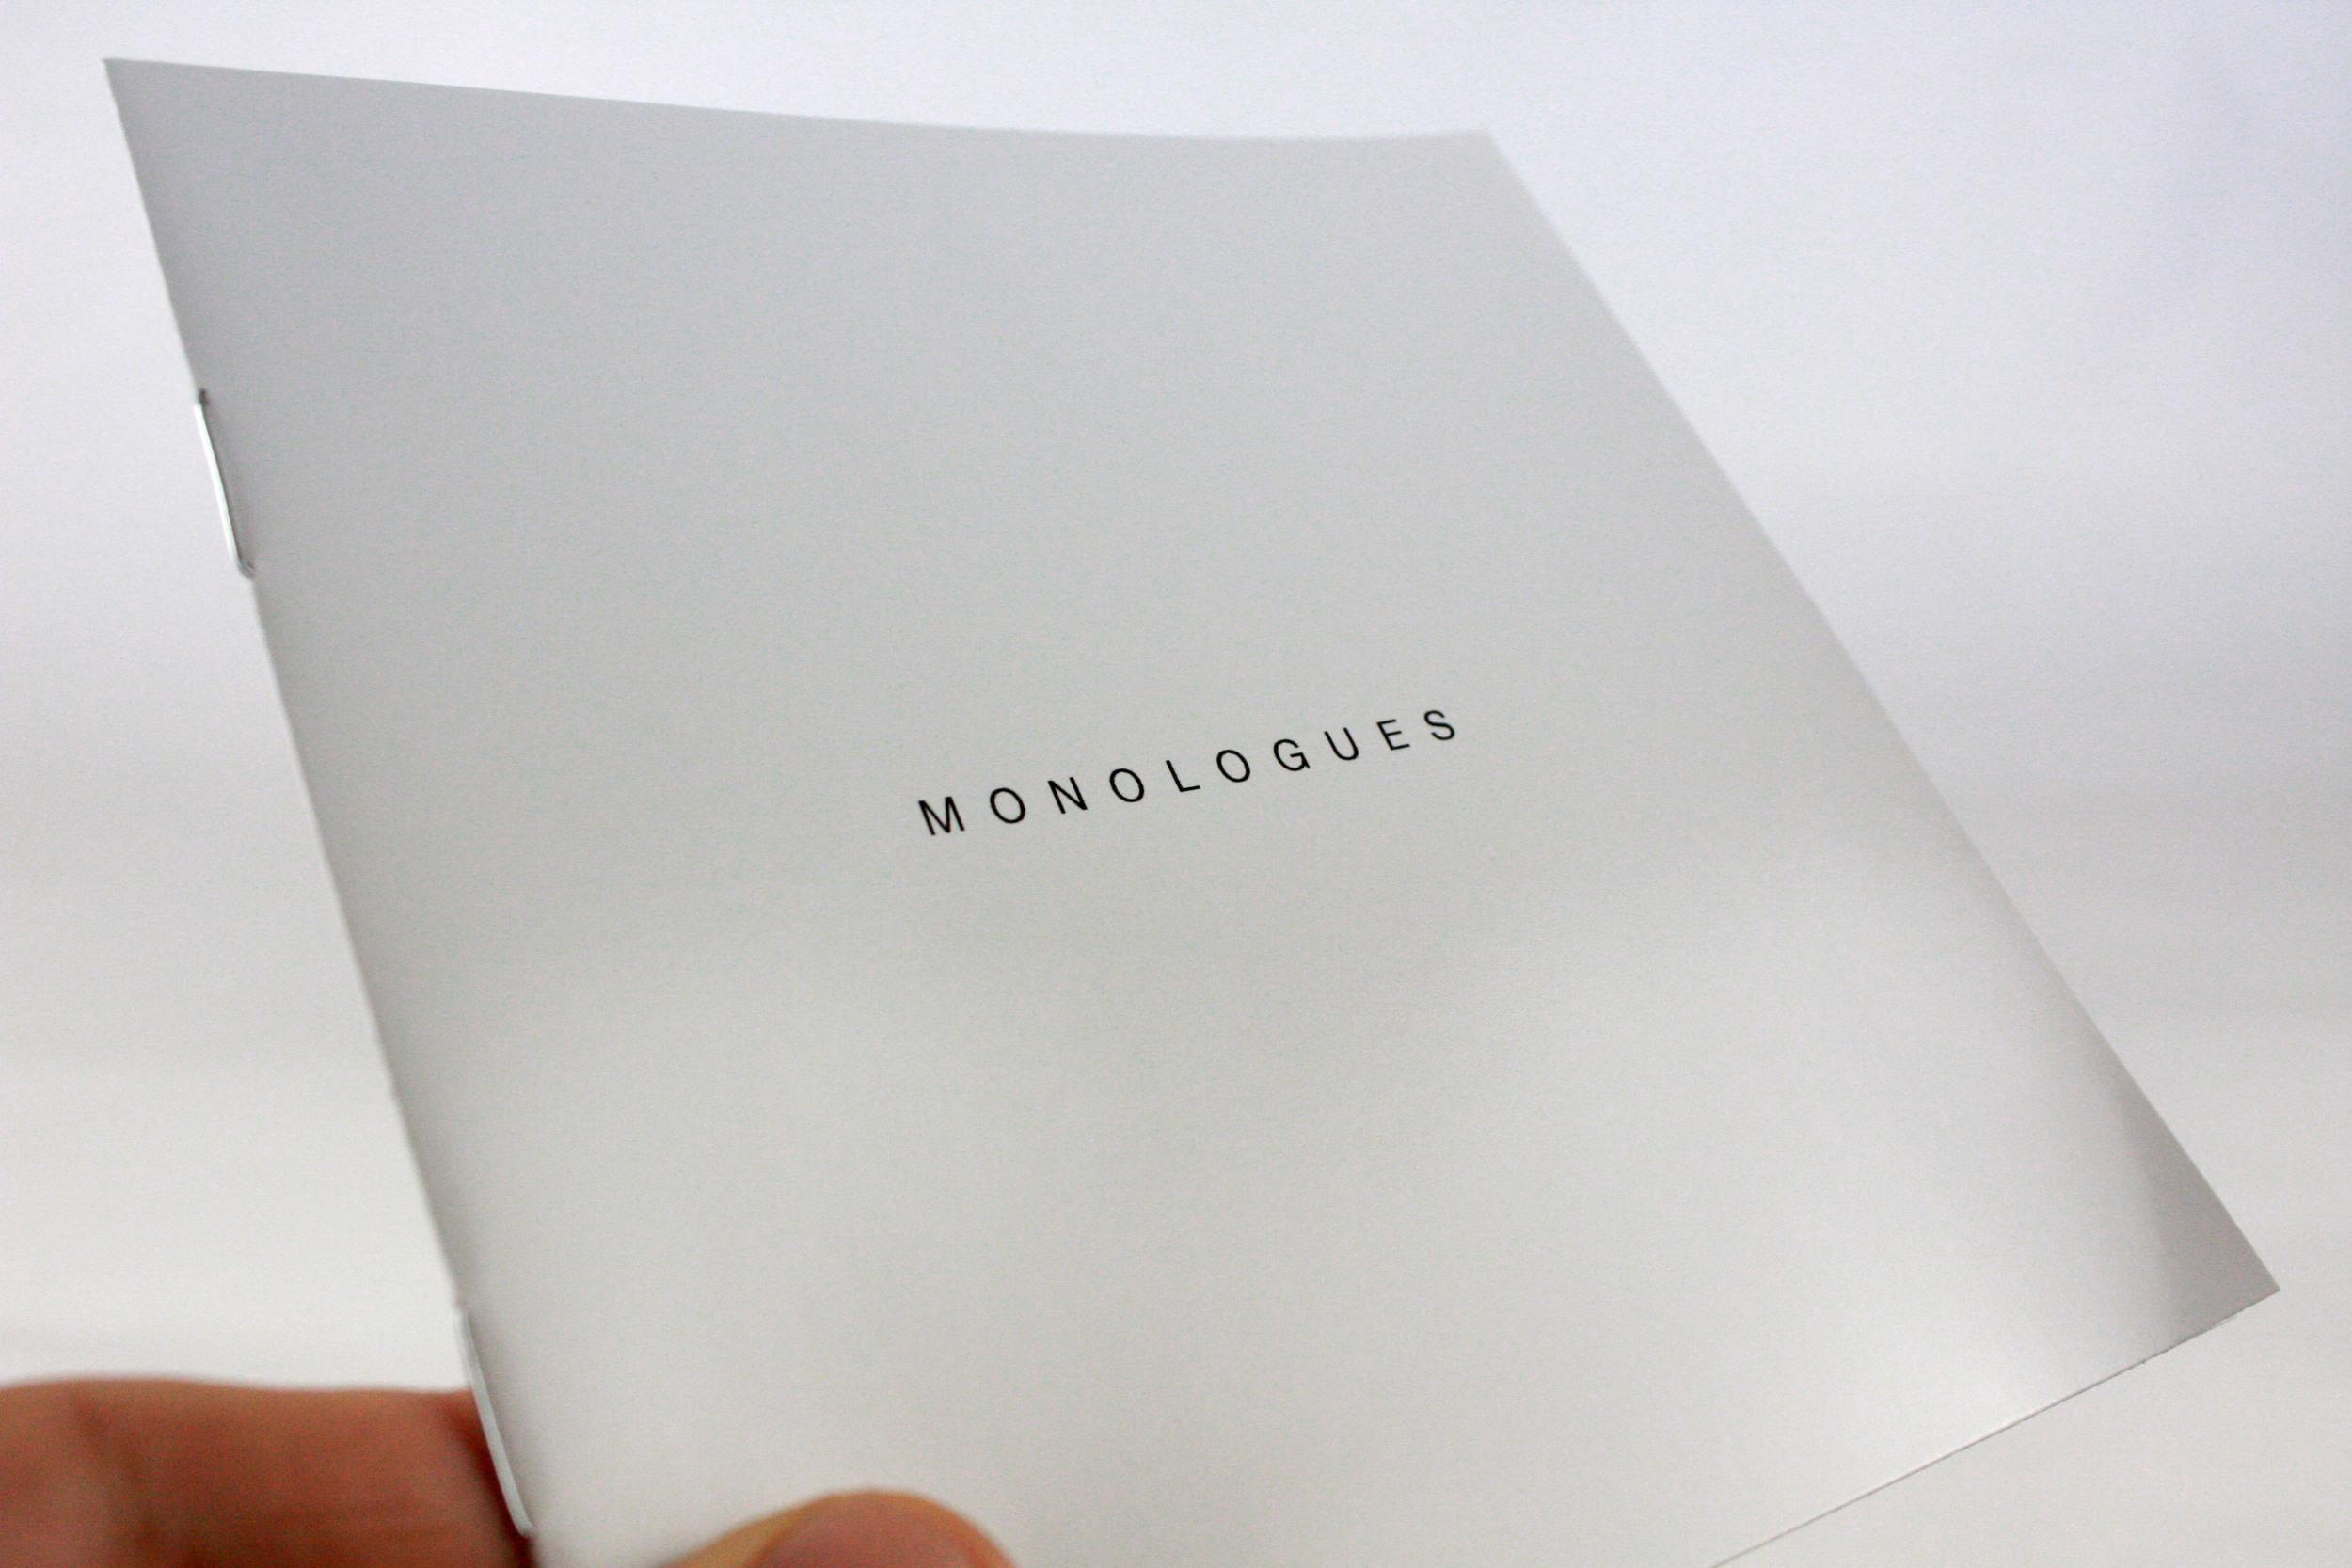 Monologues 4.jpg